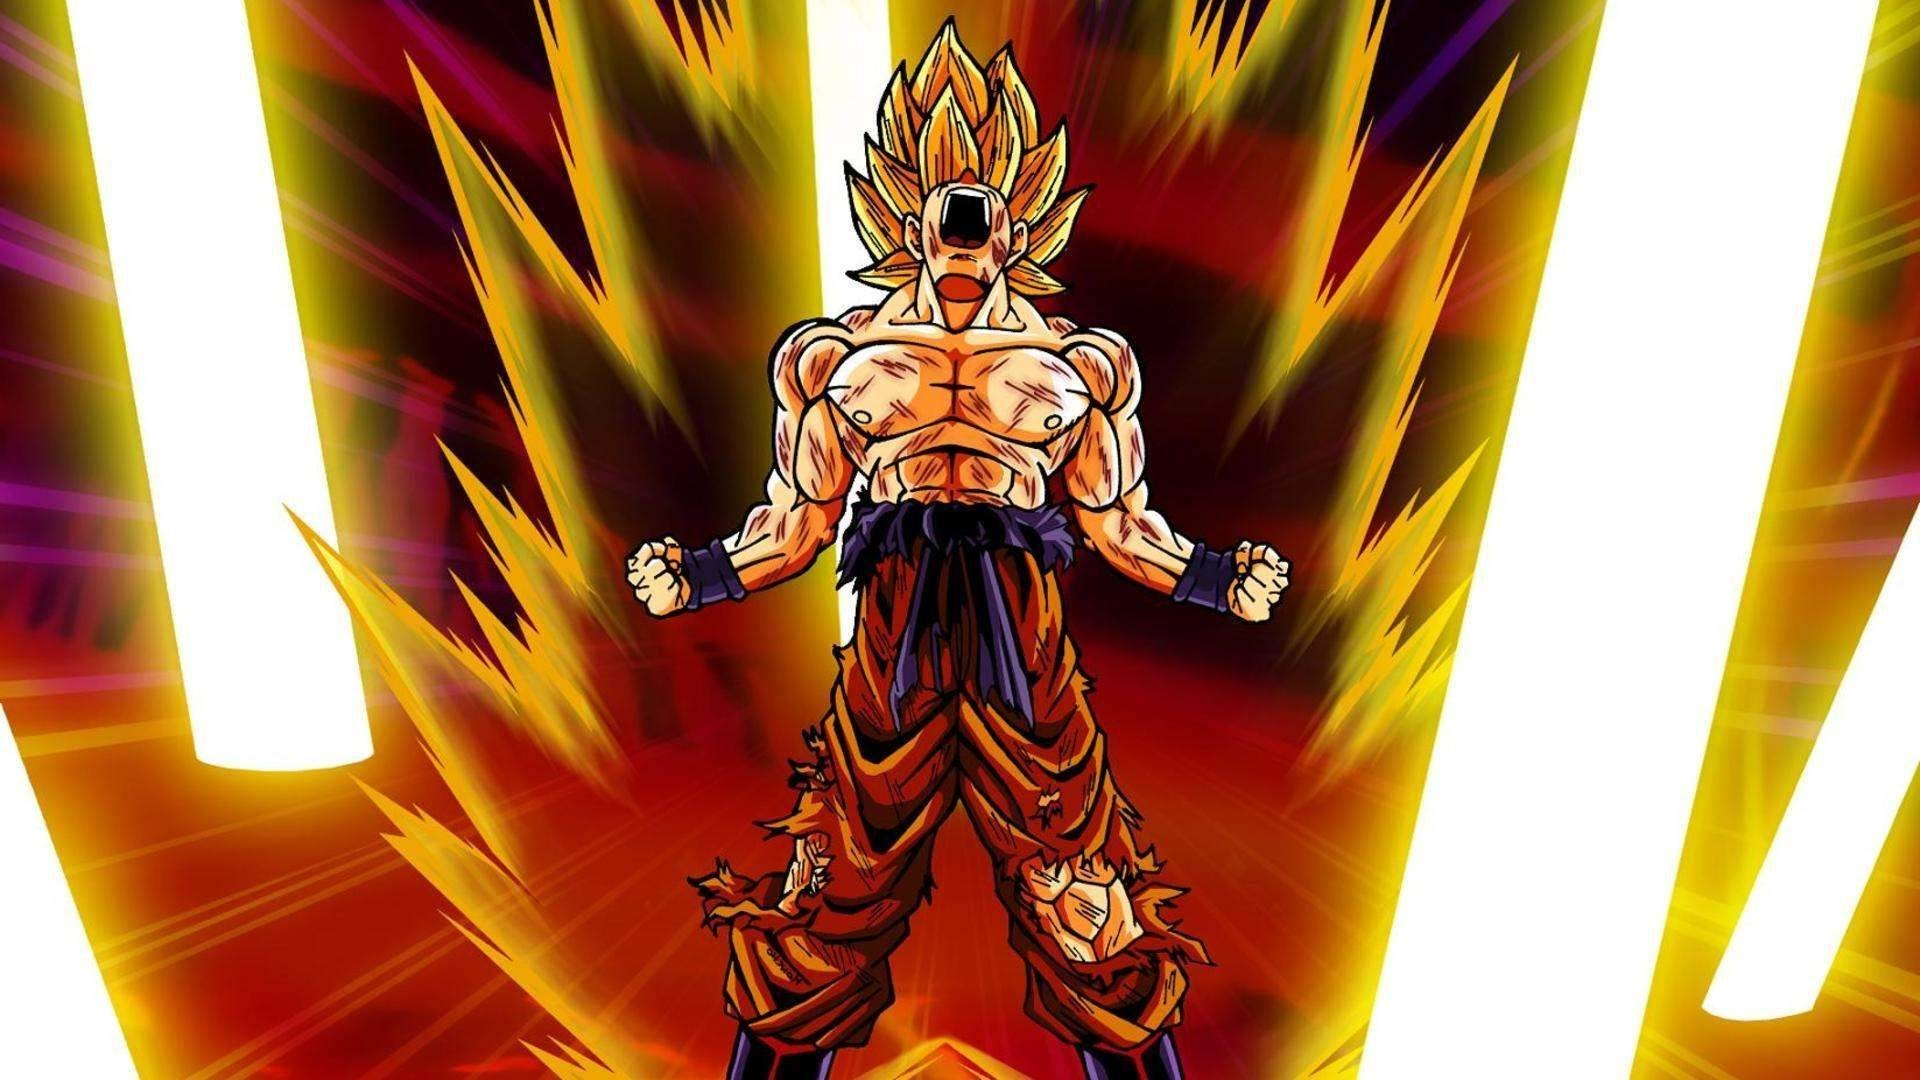 Goku Super Saiyan HD Wallpapers Group 1920×1080 Goku Super Saiyan 4 HD  Wallpapers  